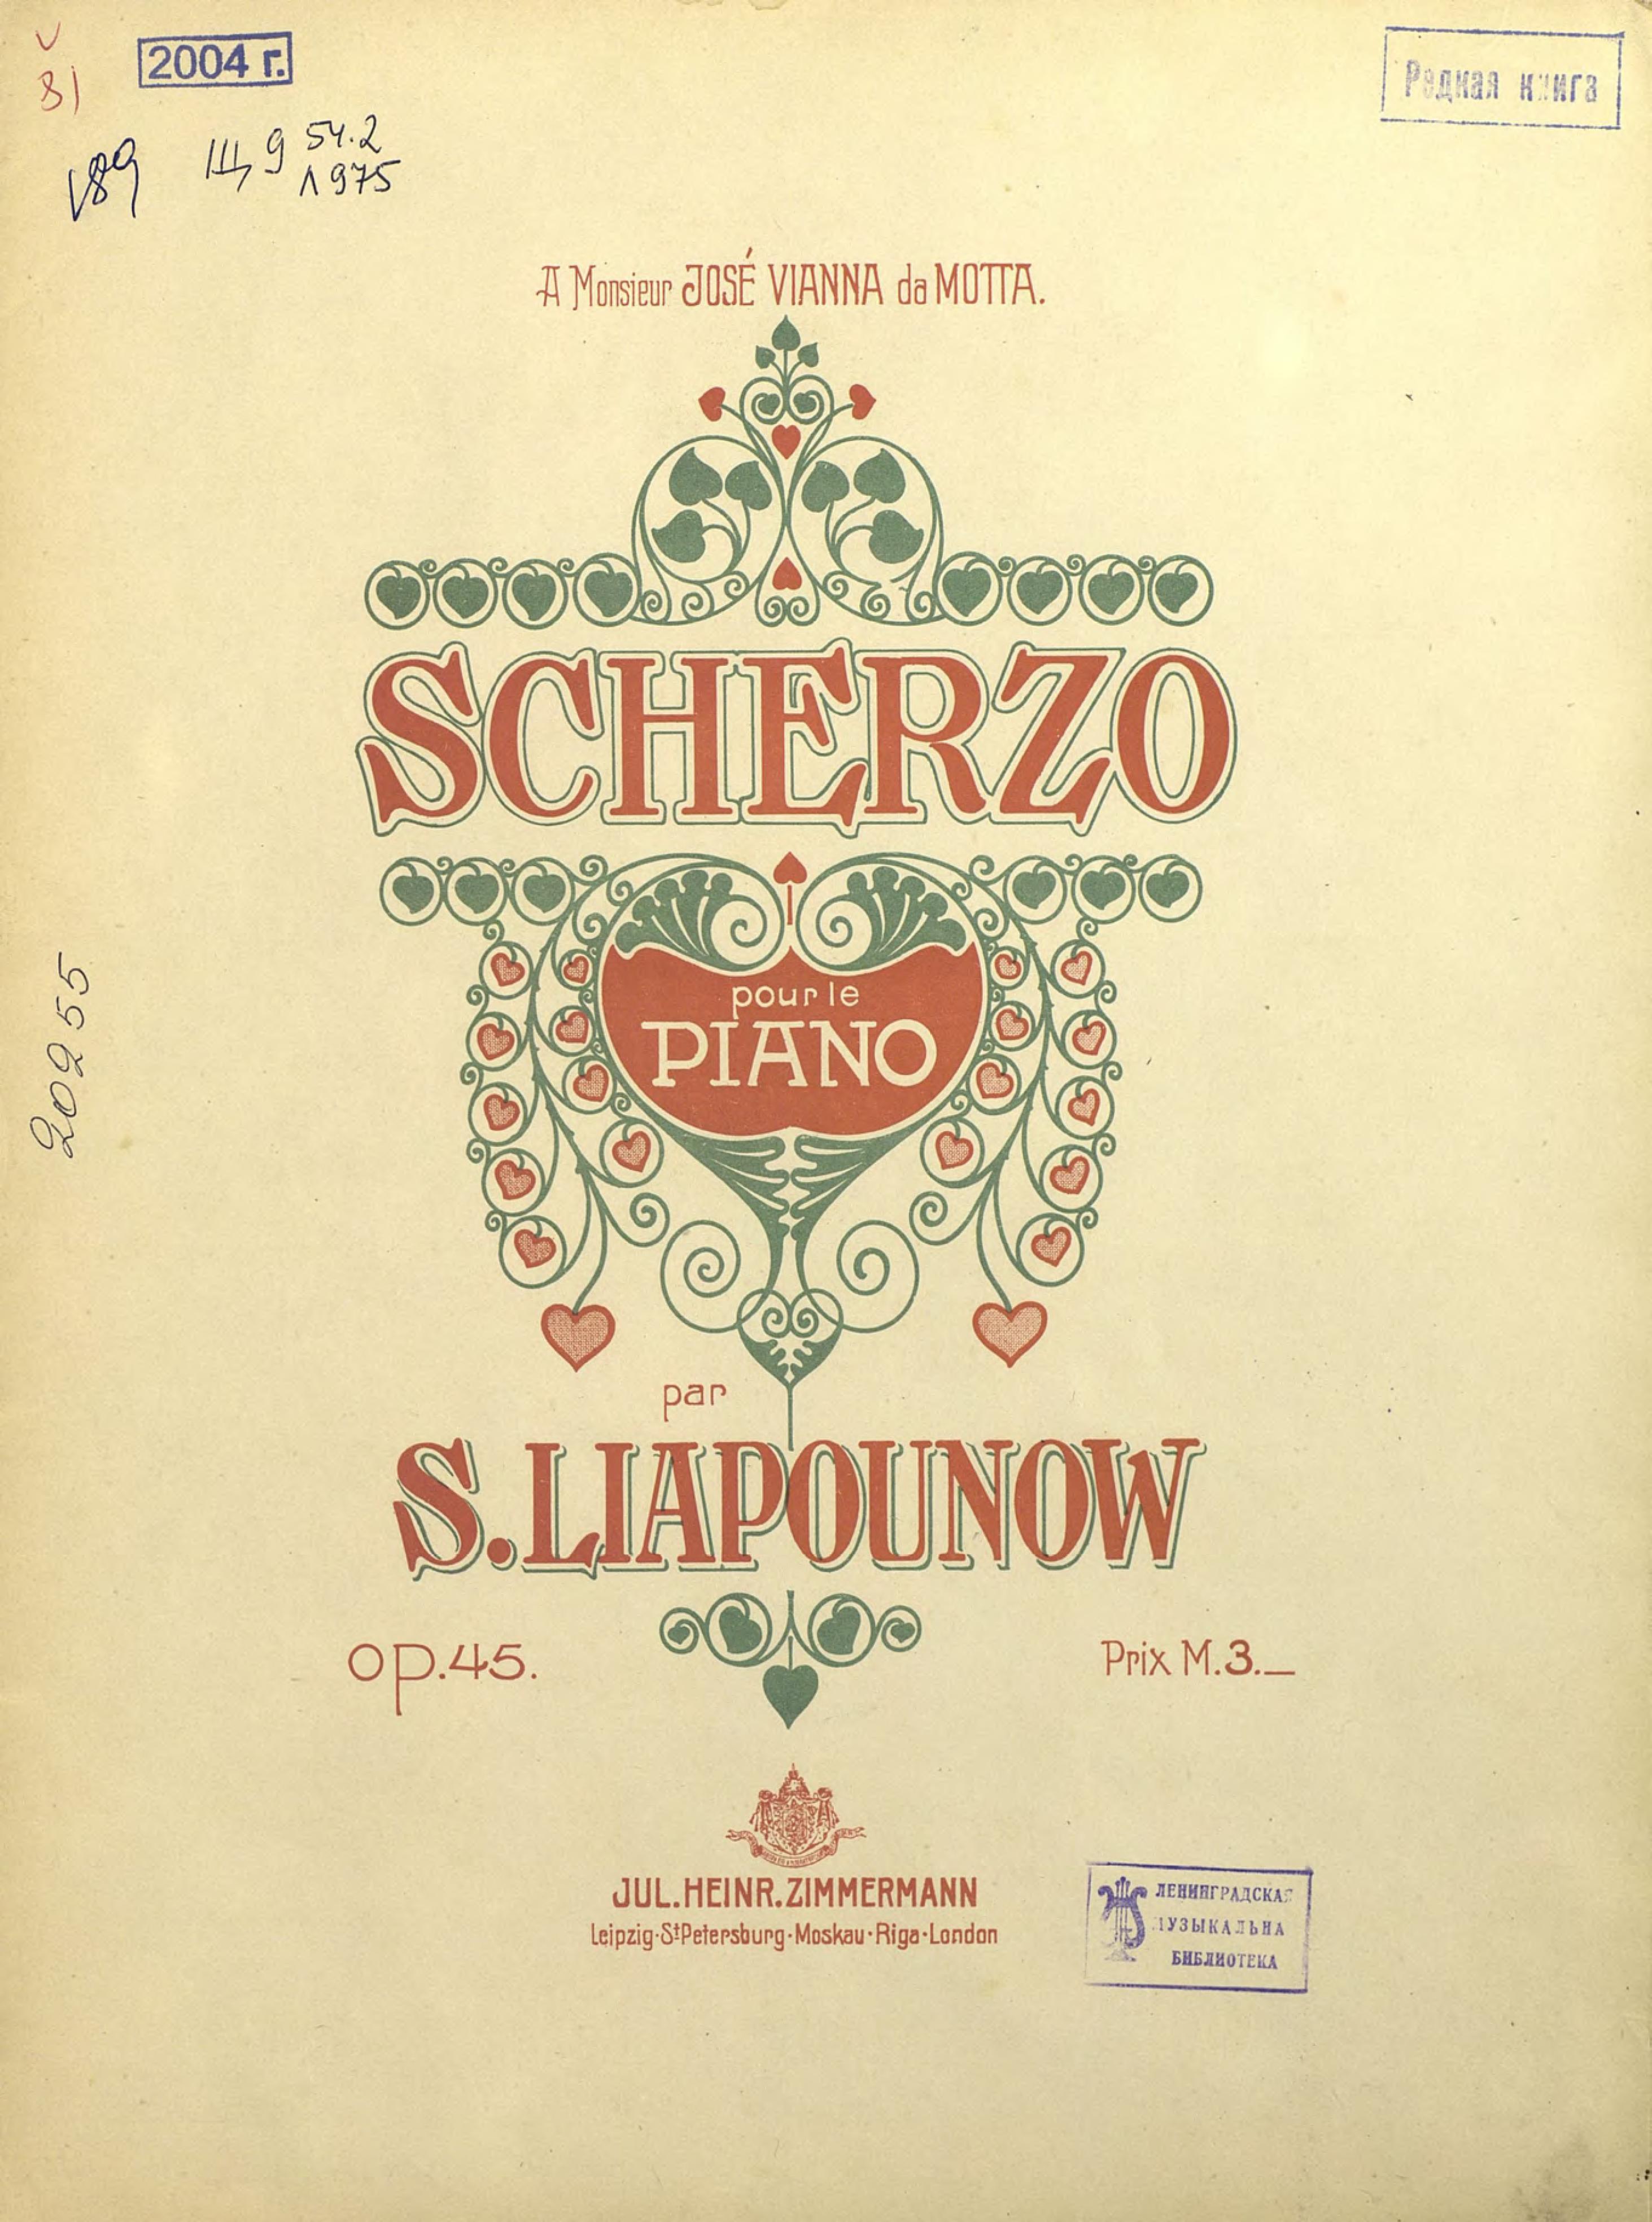 Сергей Михайлович Ляпунов Scherzo pour le piano par S. Liapunow t kullak scherzo